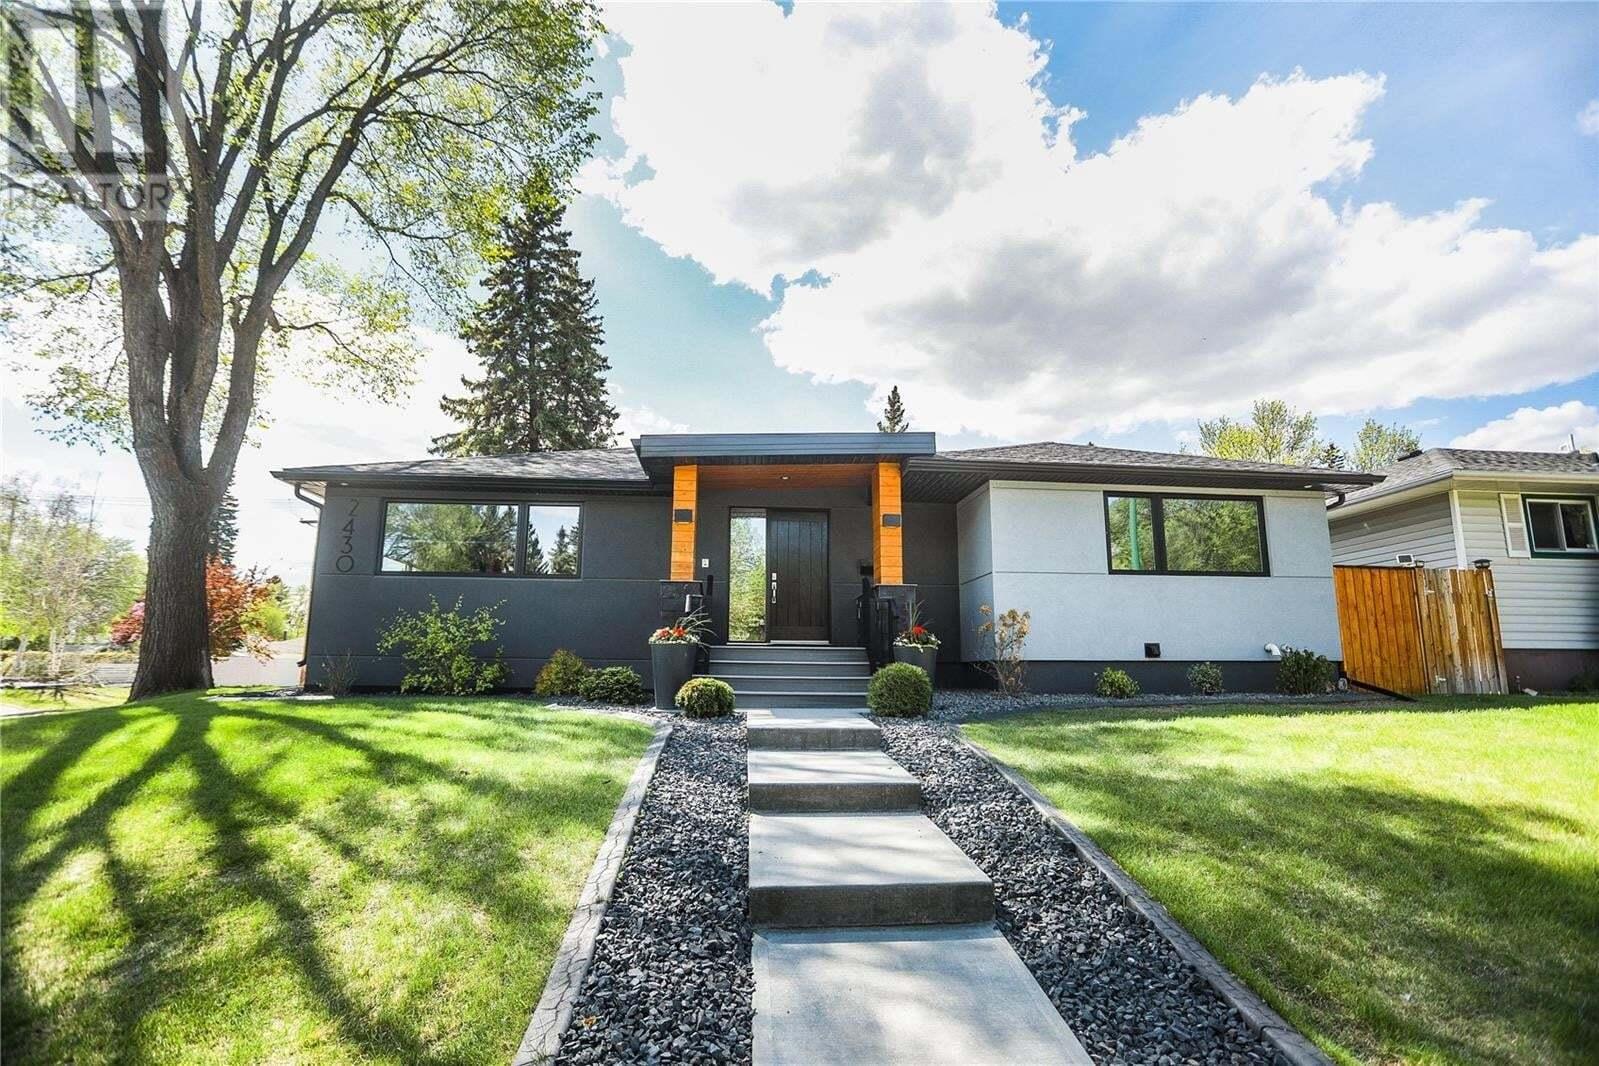 House for sale at 2430 Clarence Ave S Saskatoon Saskatchewan - MLS: SK809897